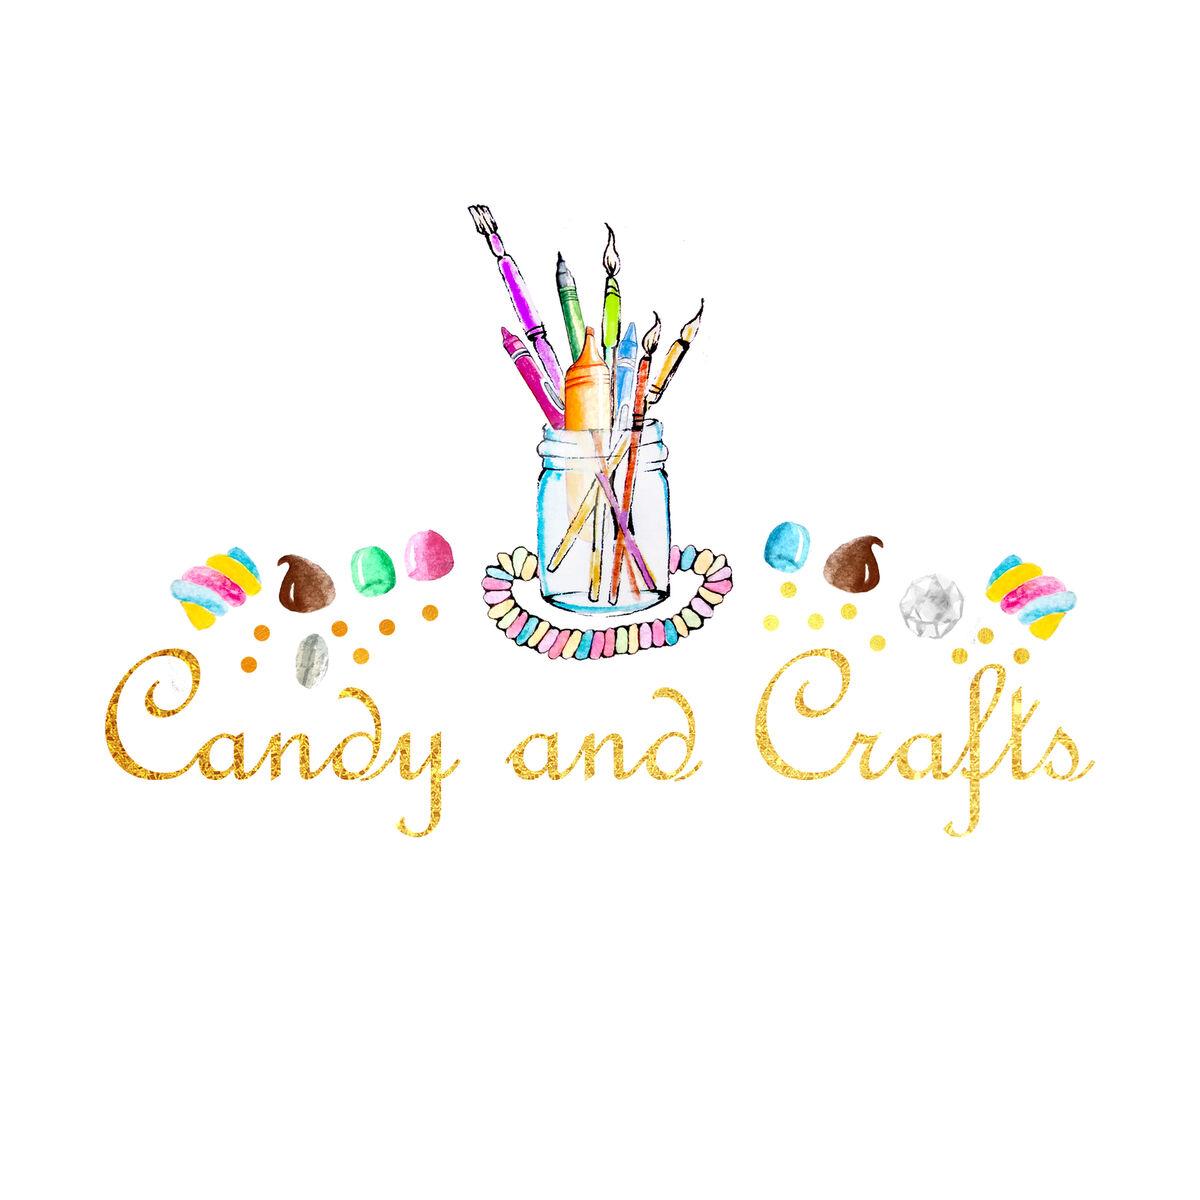 candyandcrafts